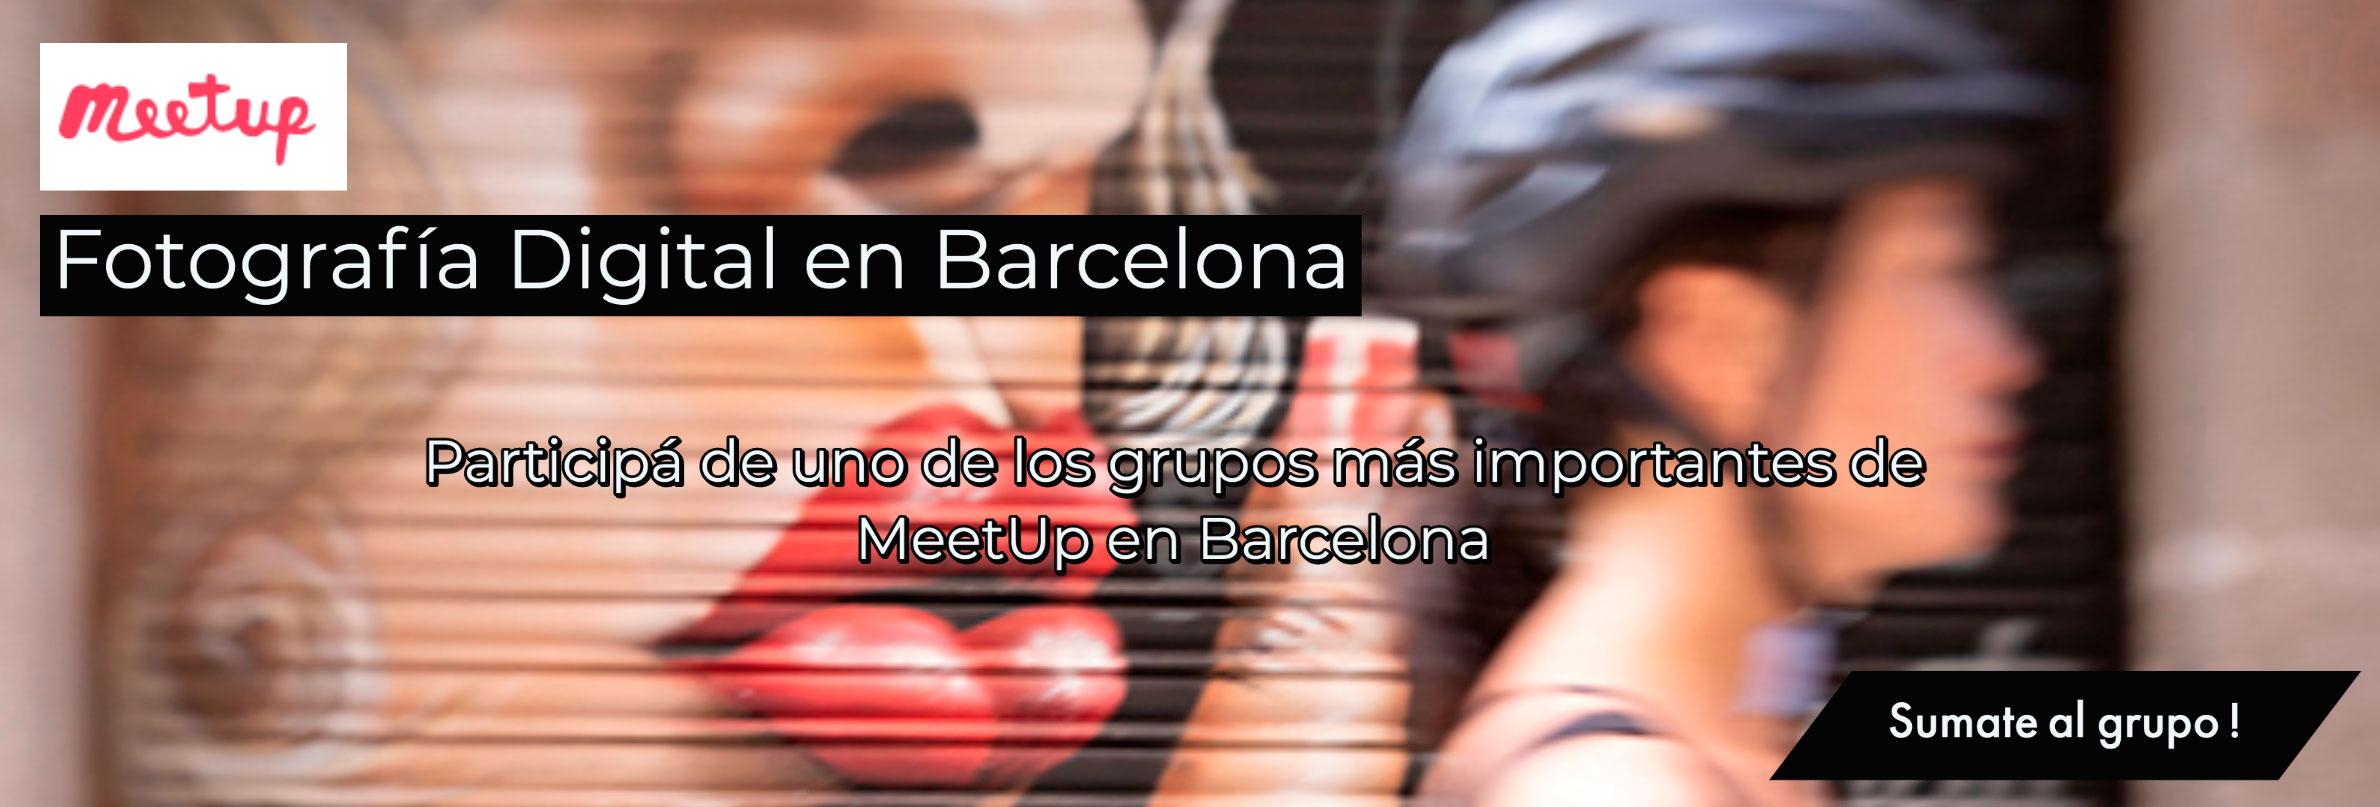 MeetupBarcelona